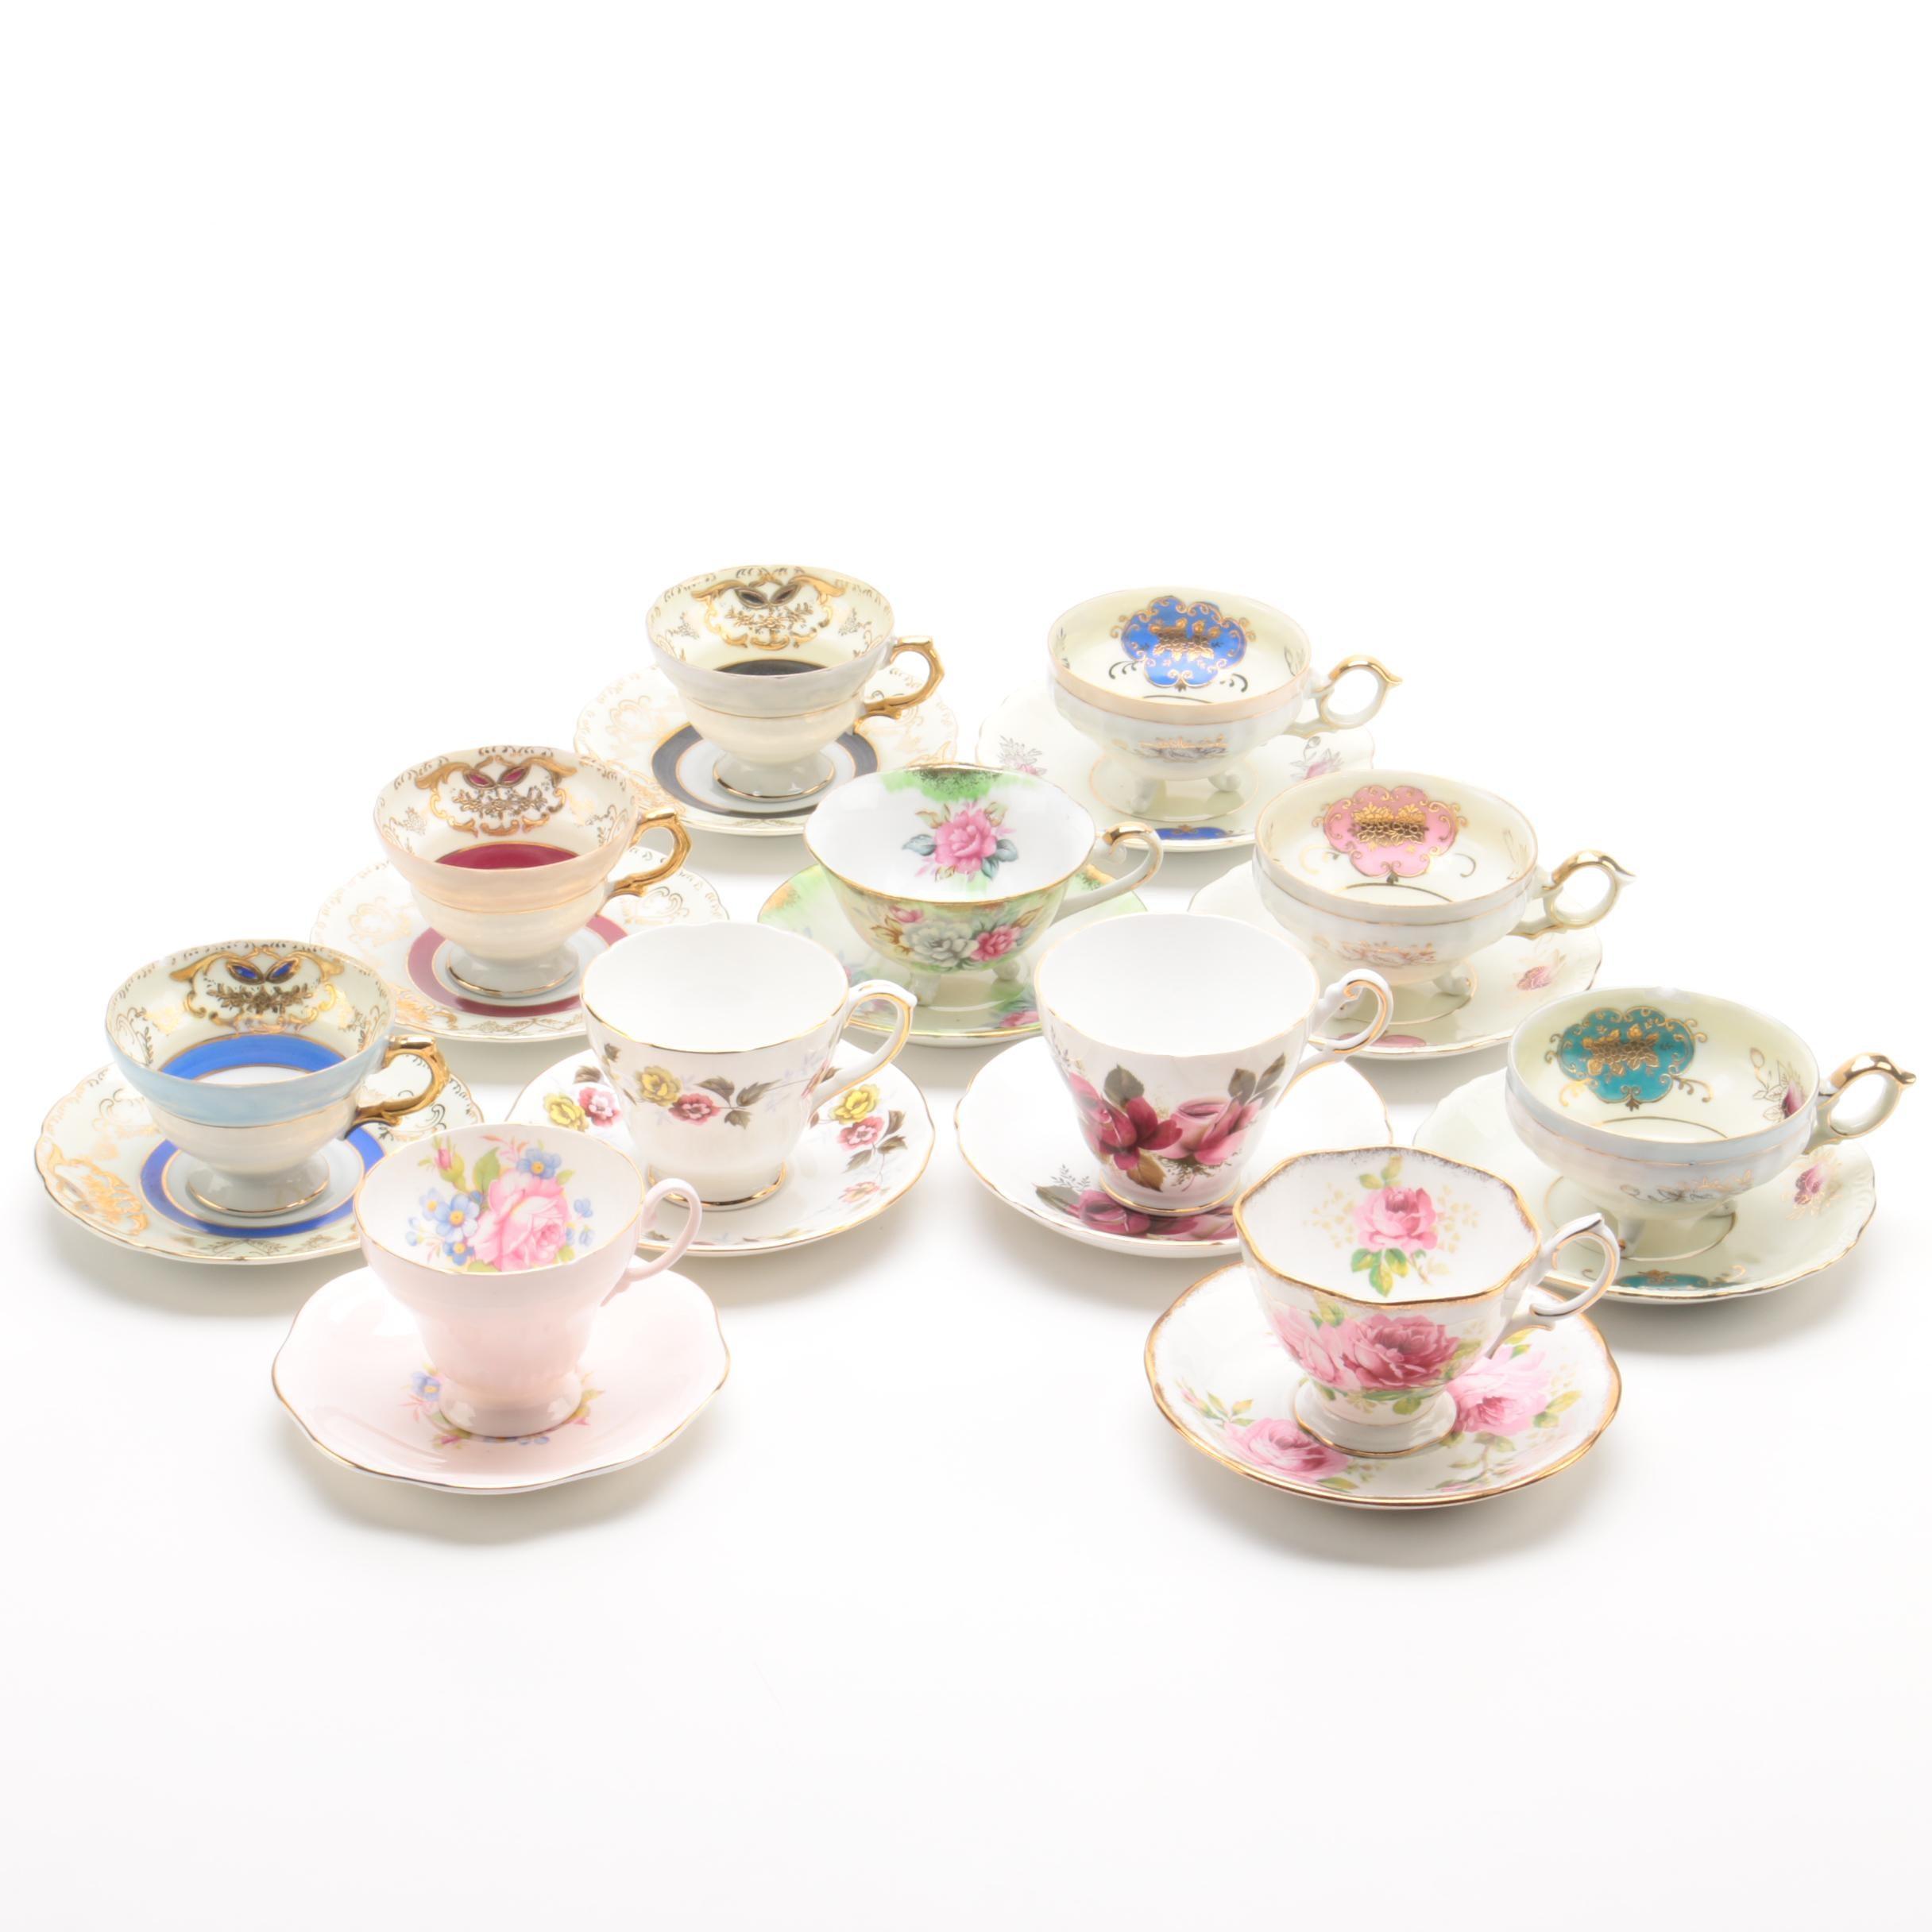 Teacups and Saucers Including Royal Albert